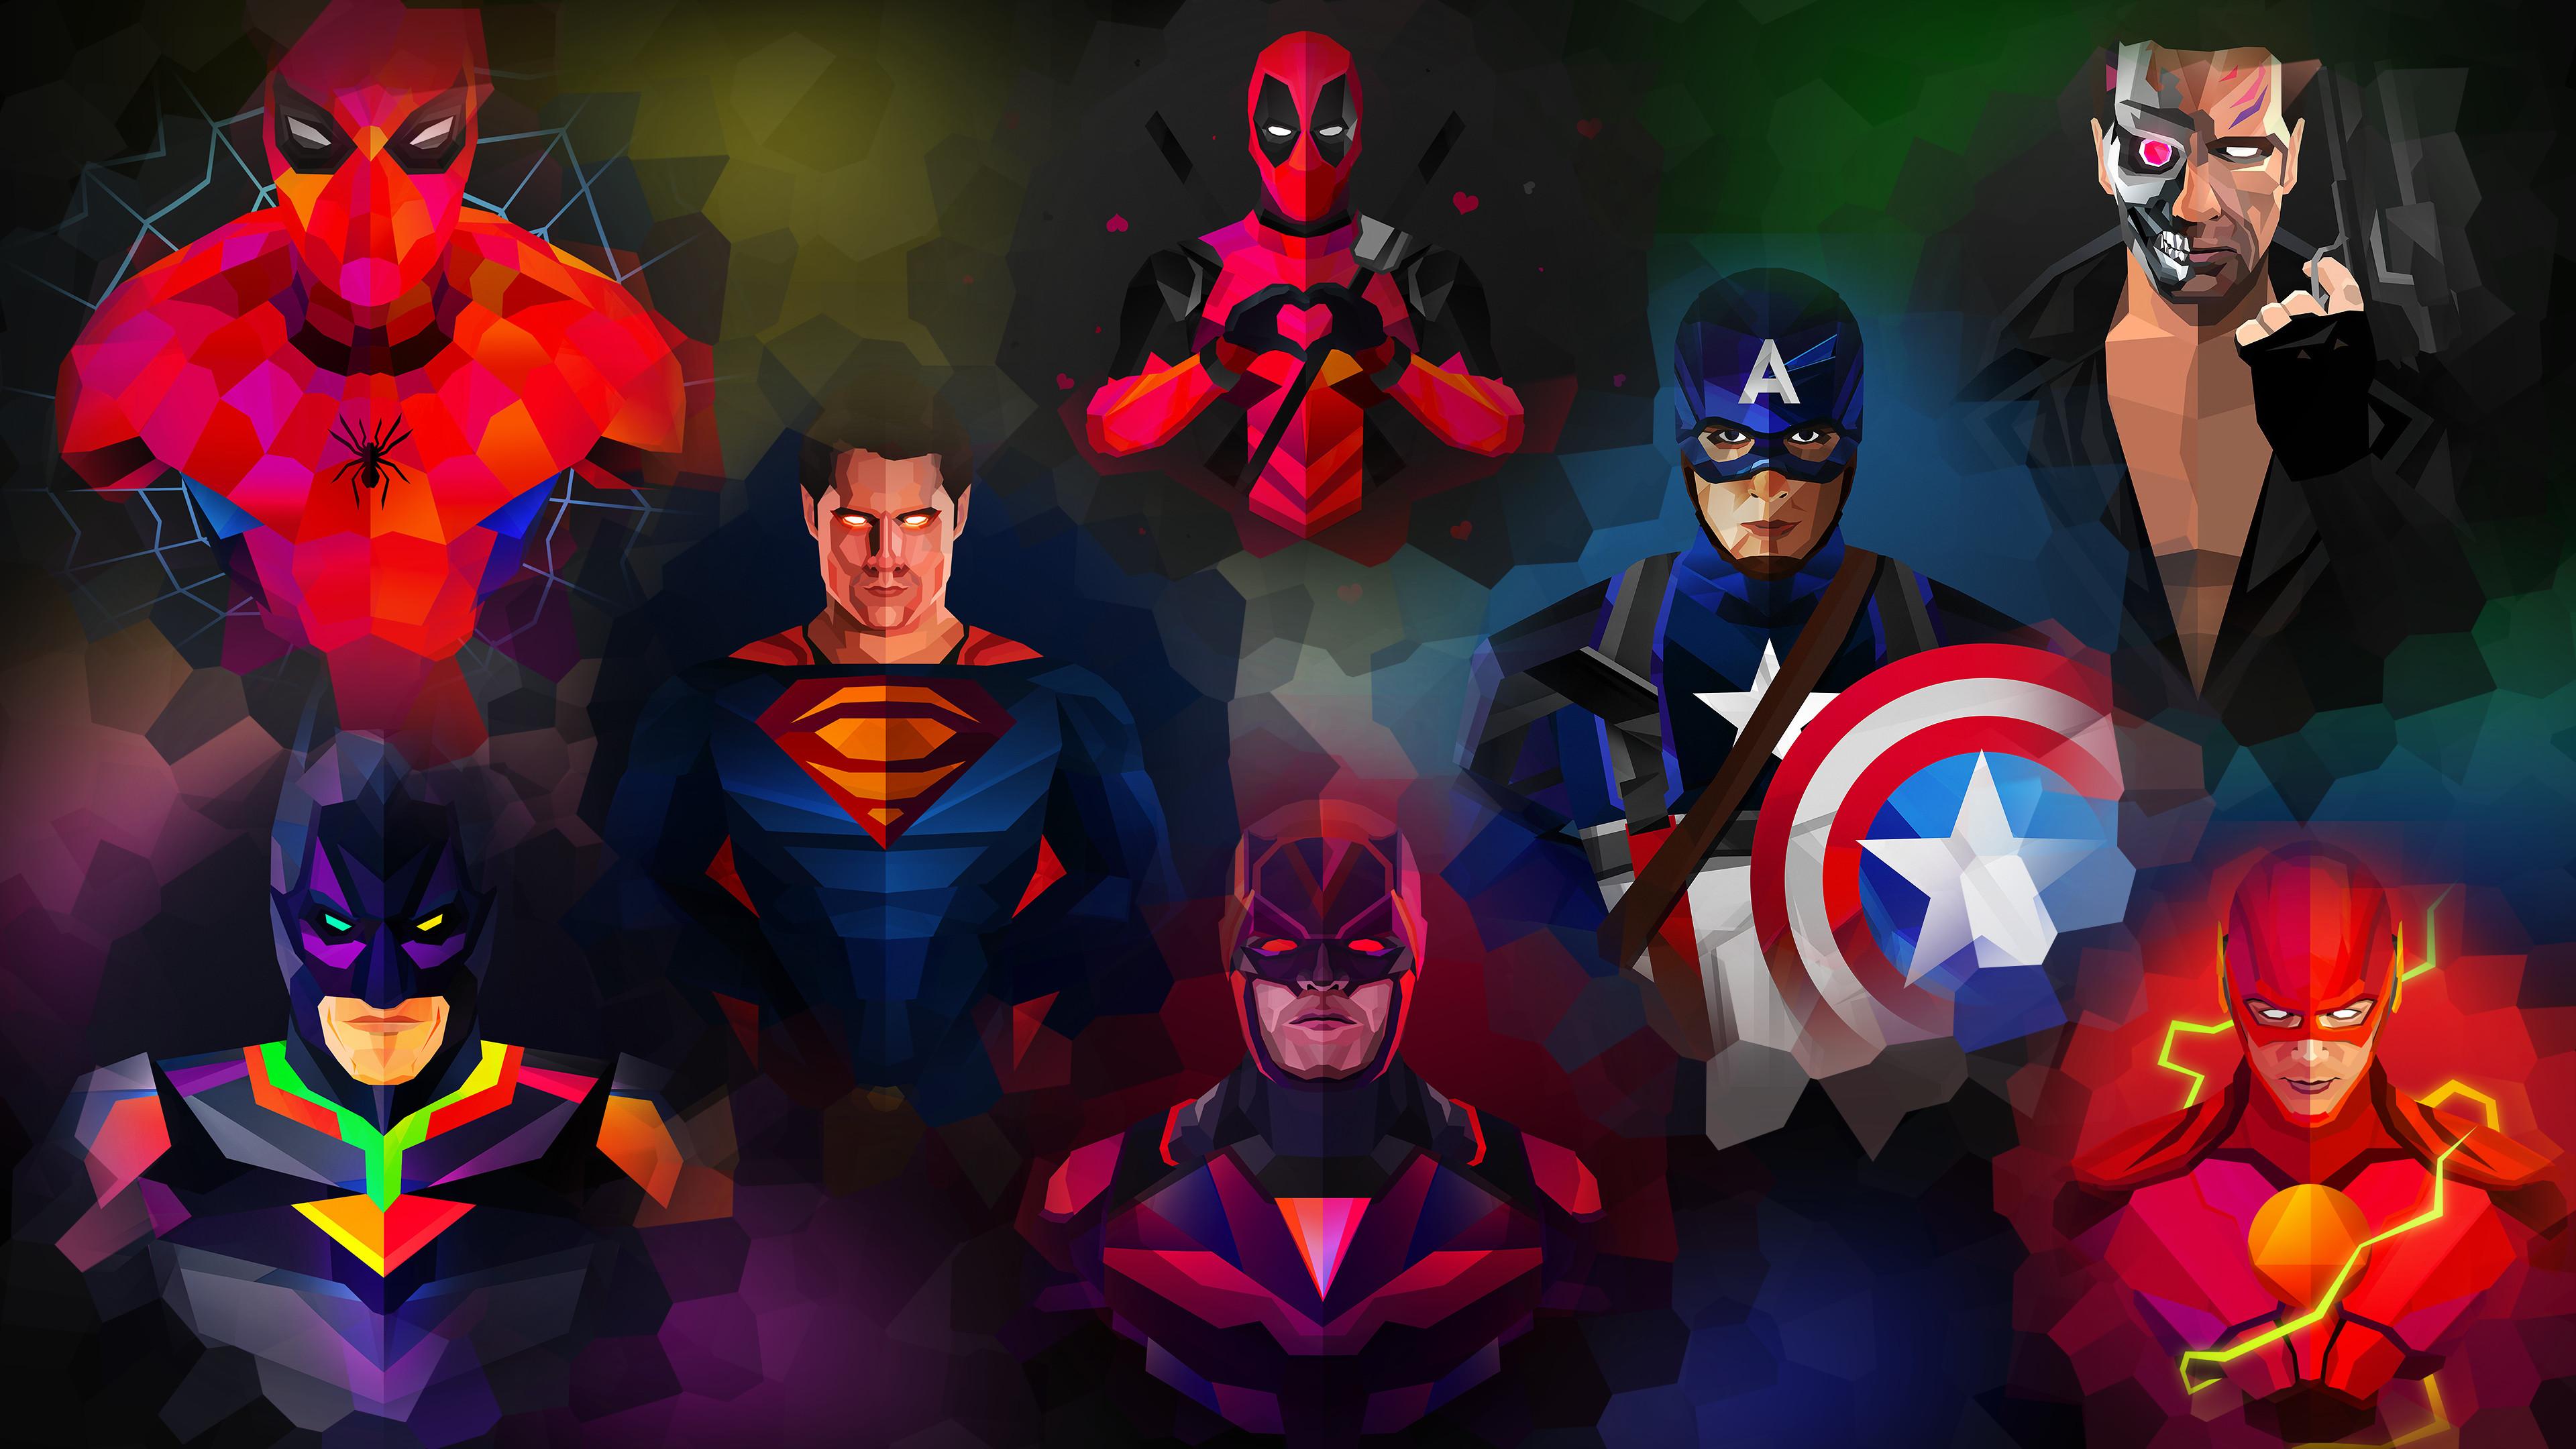 Superhero wallpaper 62 images - Superhero background wallpaper ...